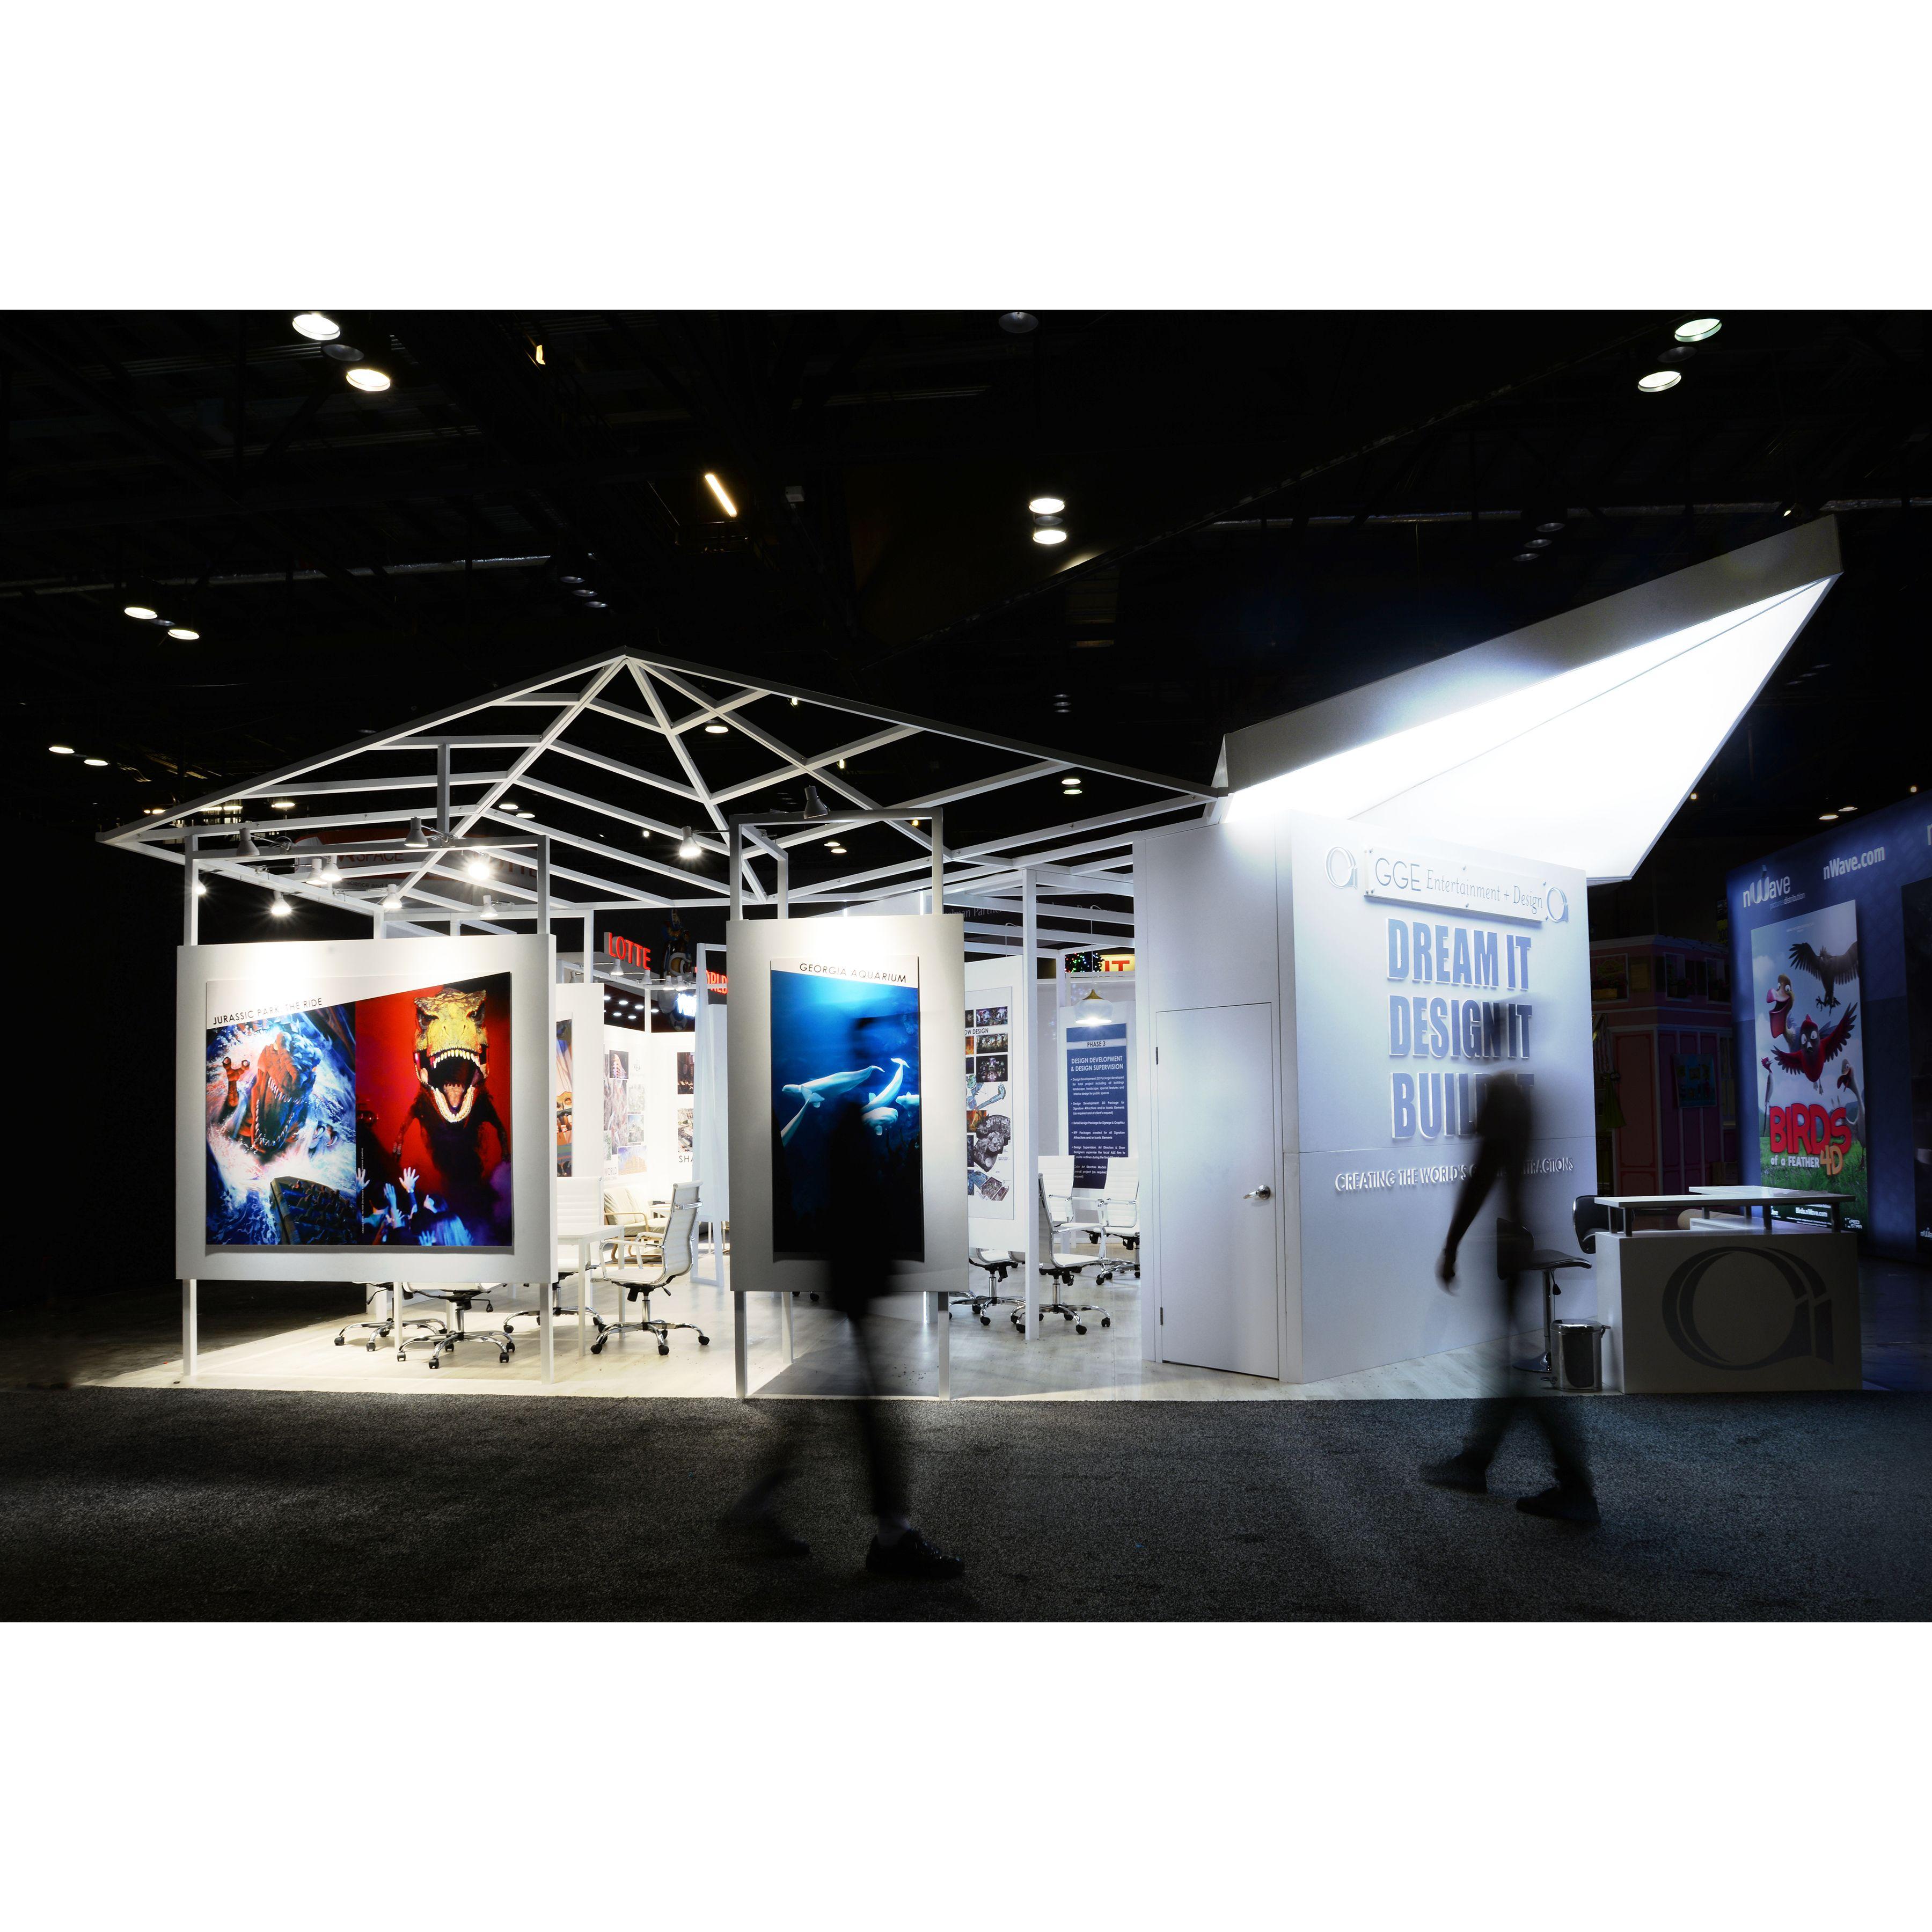 Silver A Design Award Winner For Interior Space And Exhibition Design Category In 2017 2018 Design Design Awards Interior